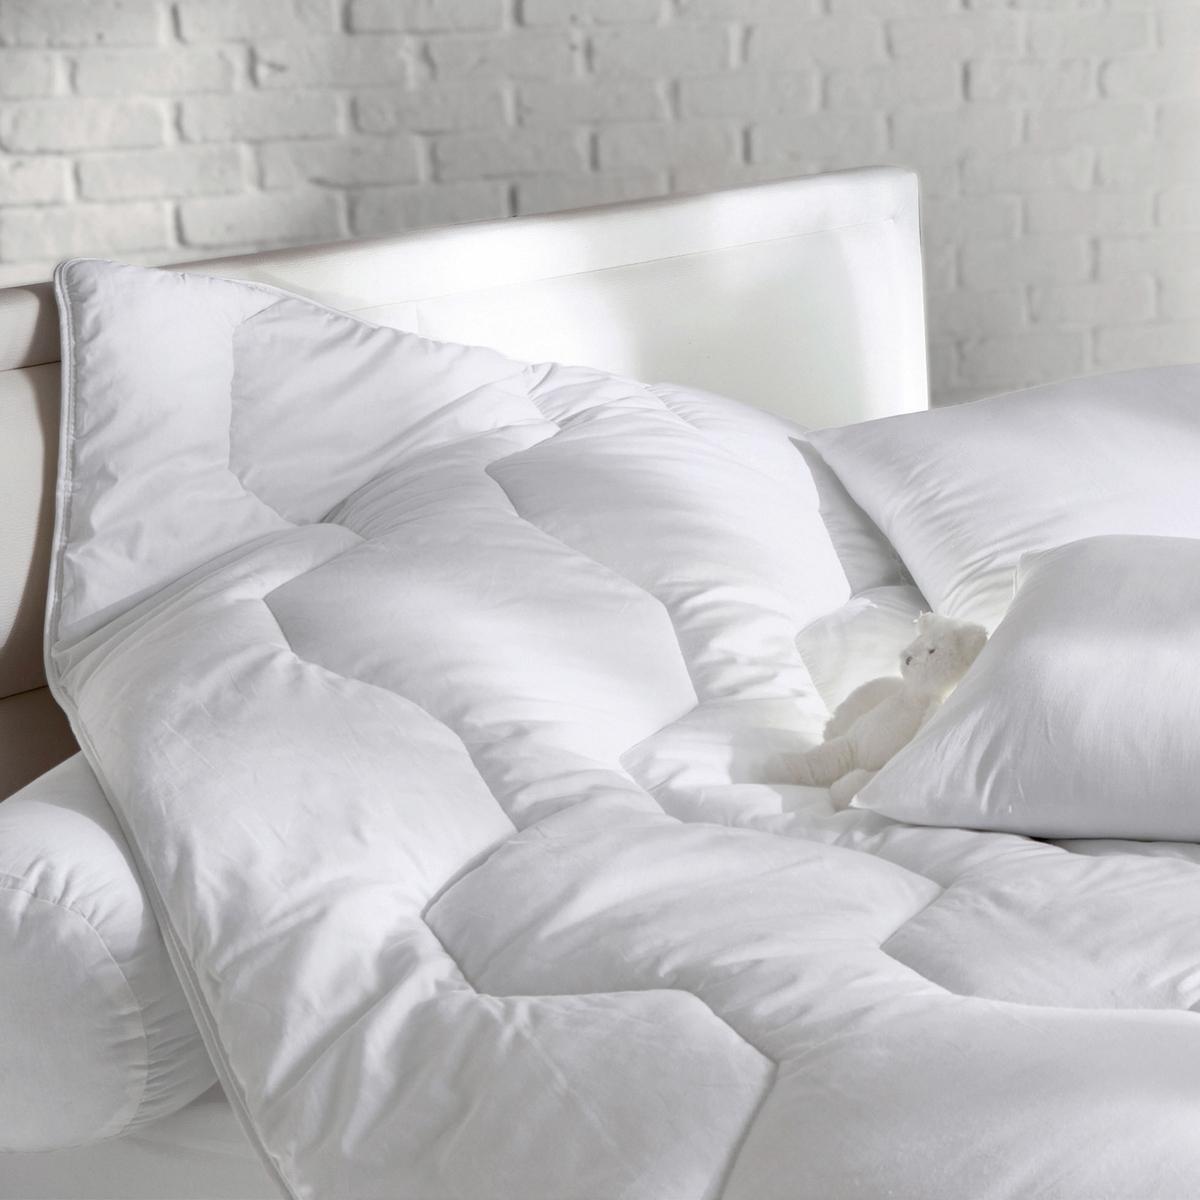 цена Одеяло La Redoute Синтетическое гм с обработкой Santol 260 x 240 см белый онлайн в 2017 году